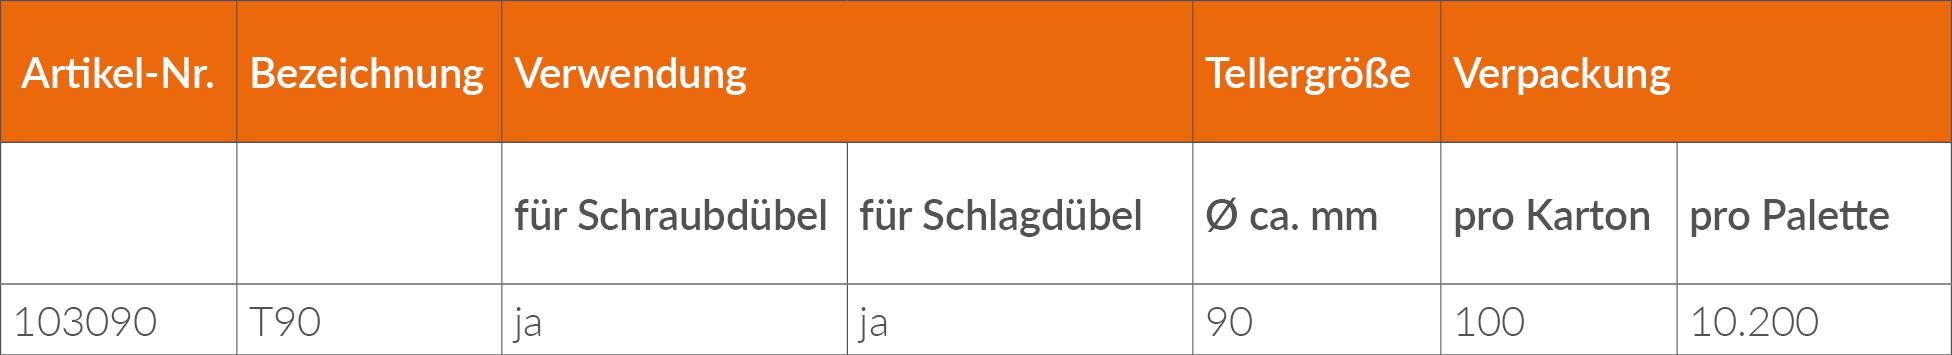 T90_Lieferprogramm